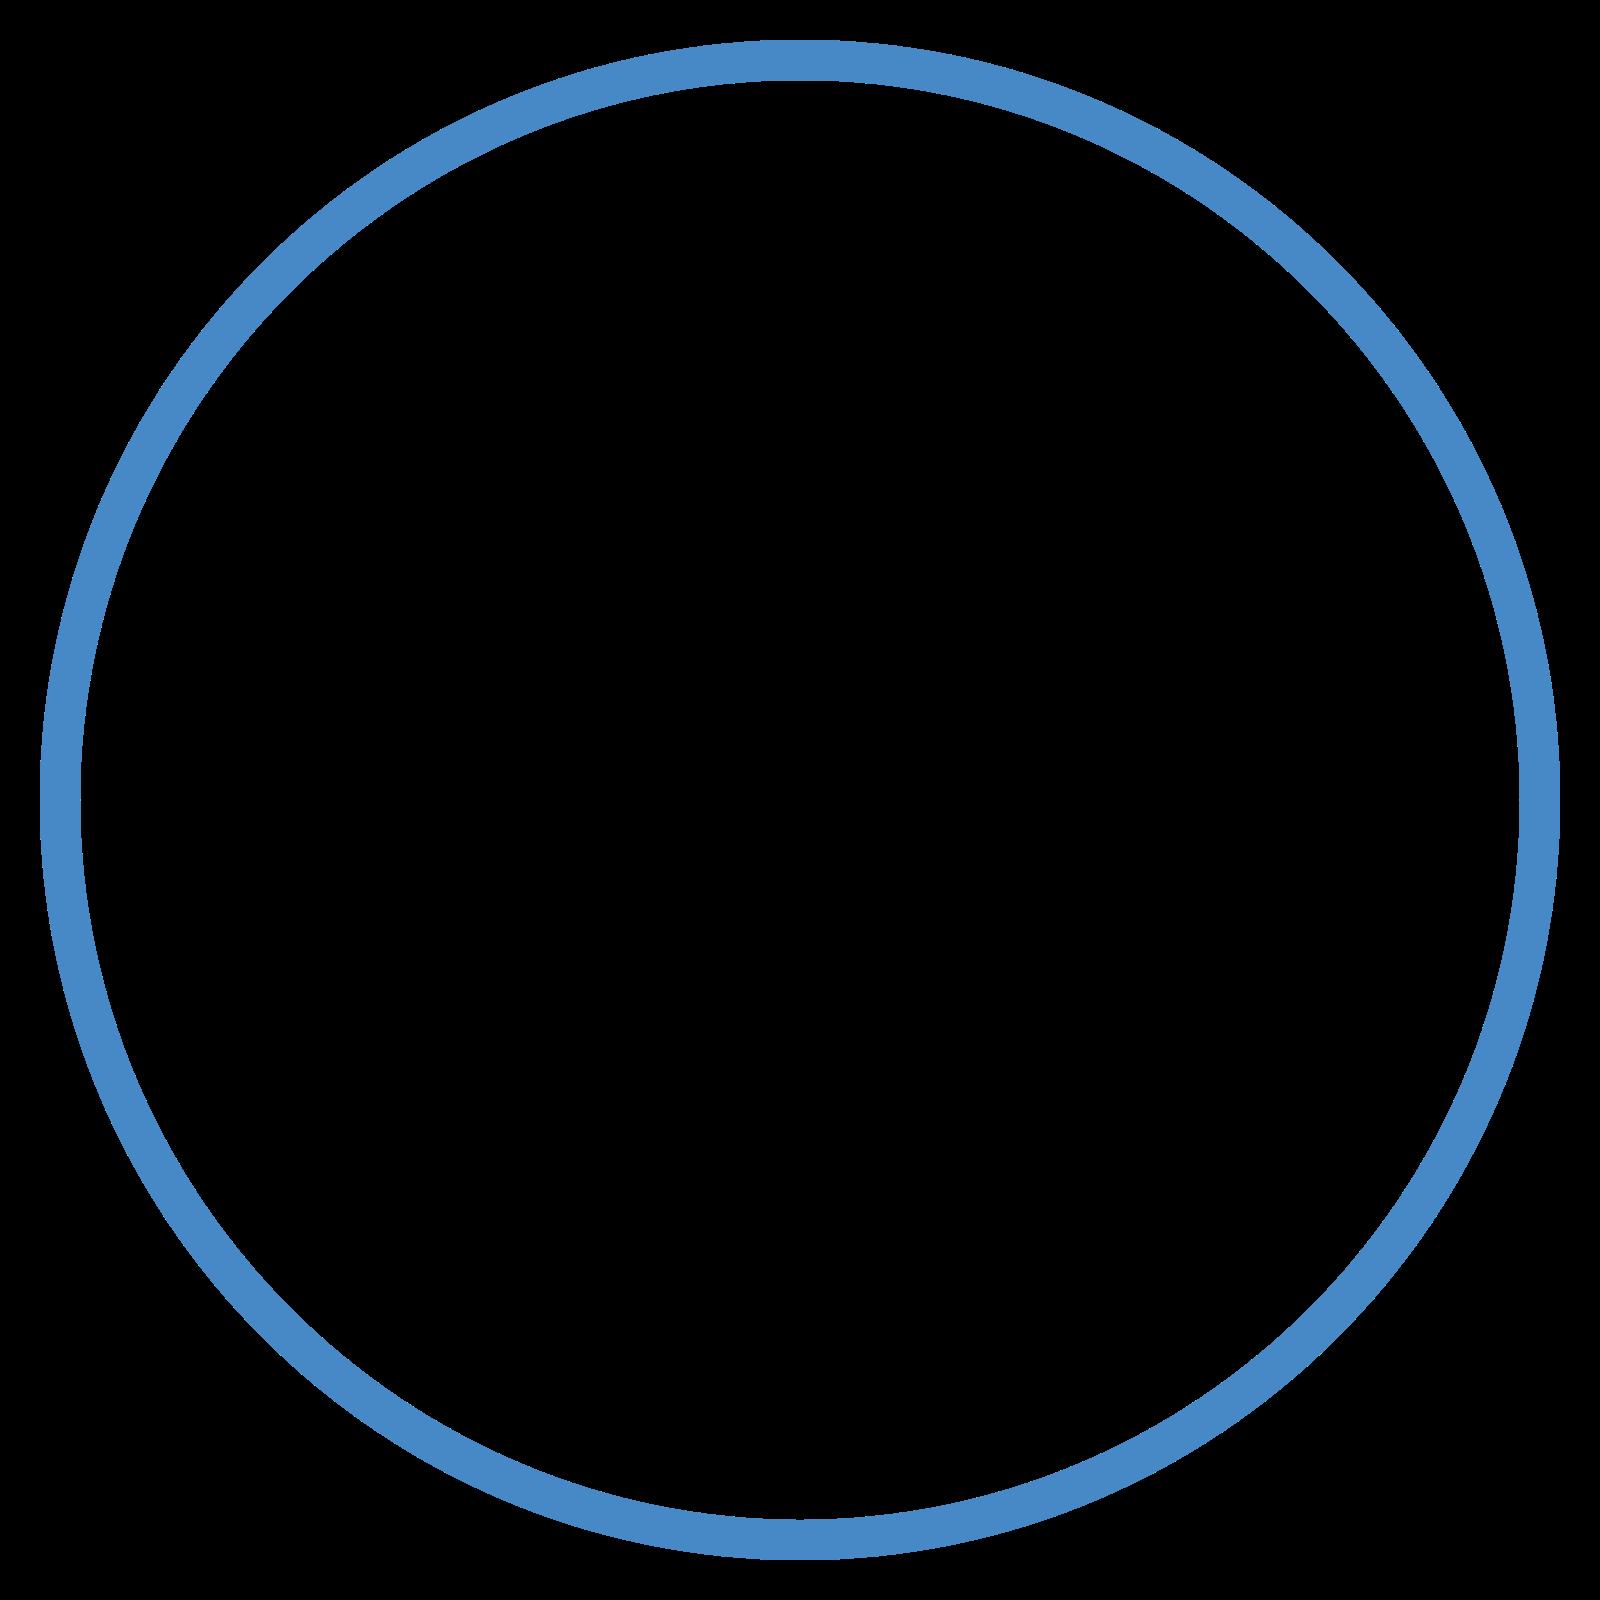 Circle Icon Clipart 15282 Transparentpng